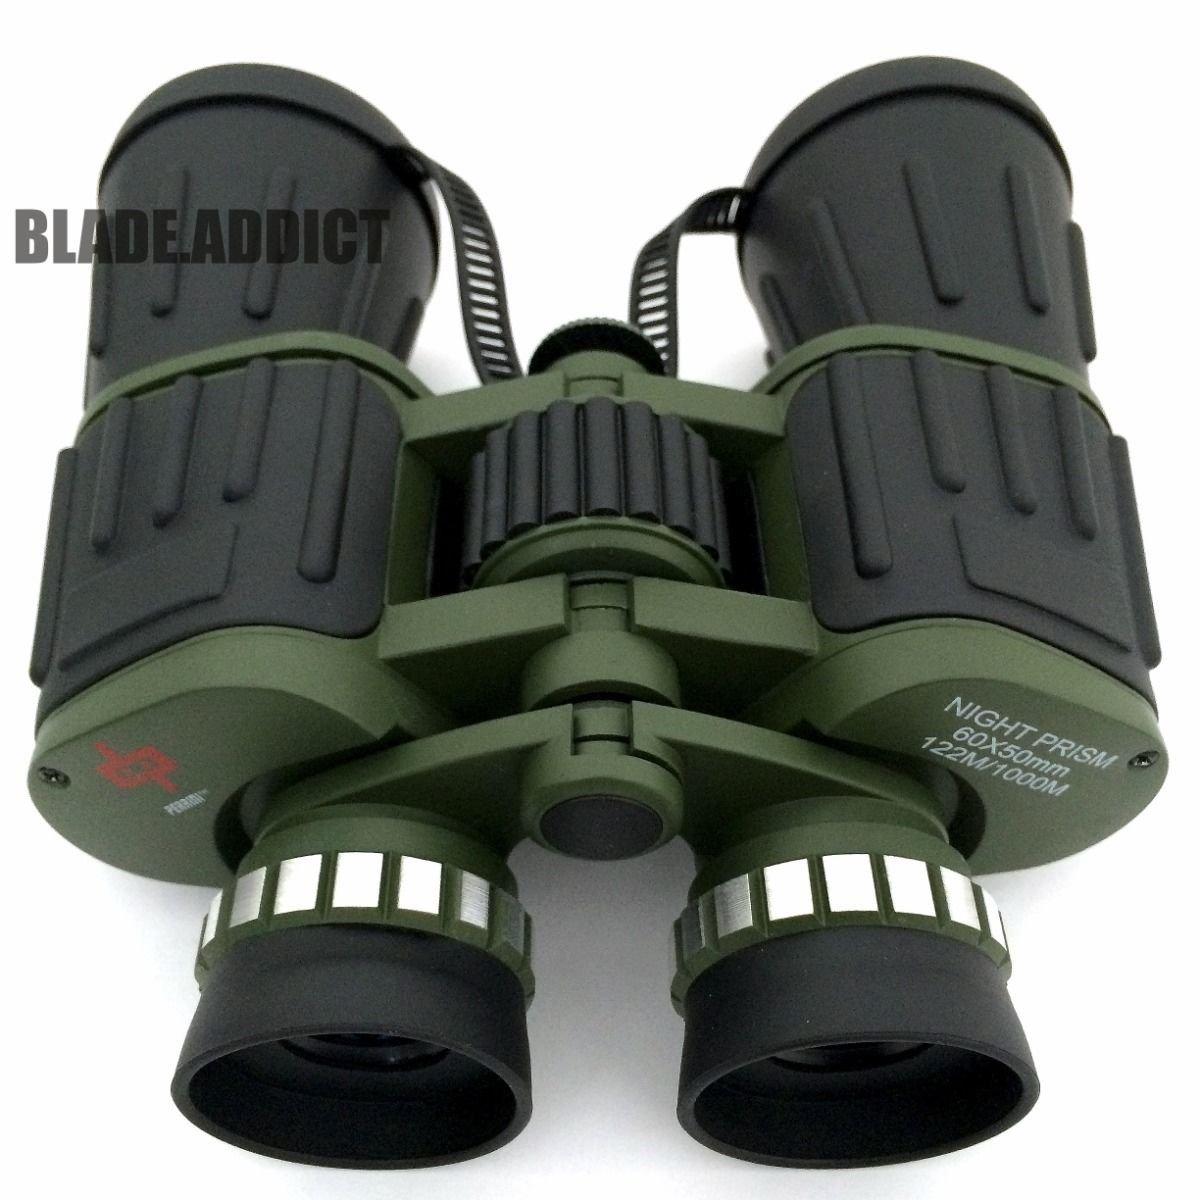 DNCE Day Night 60×50 Military Army Zoom Powerful Binoculars Optics Hunting Camping